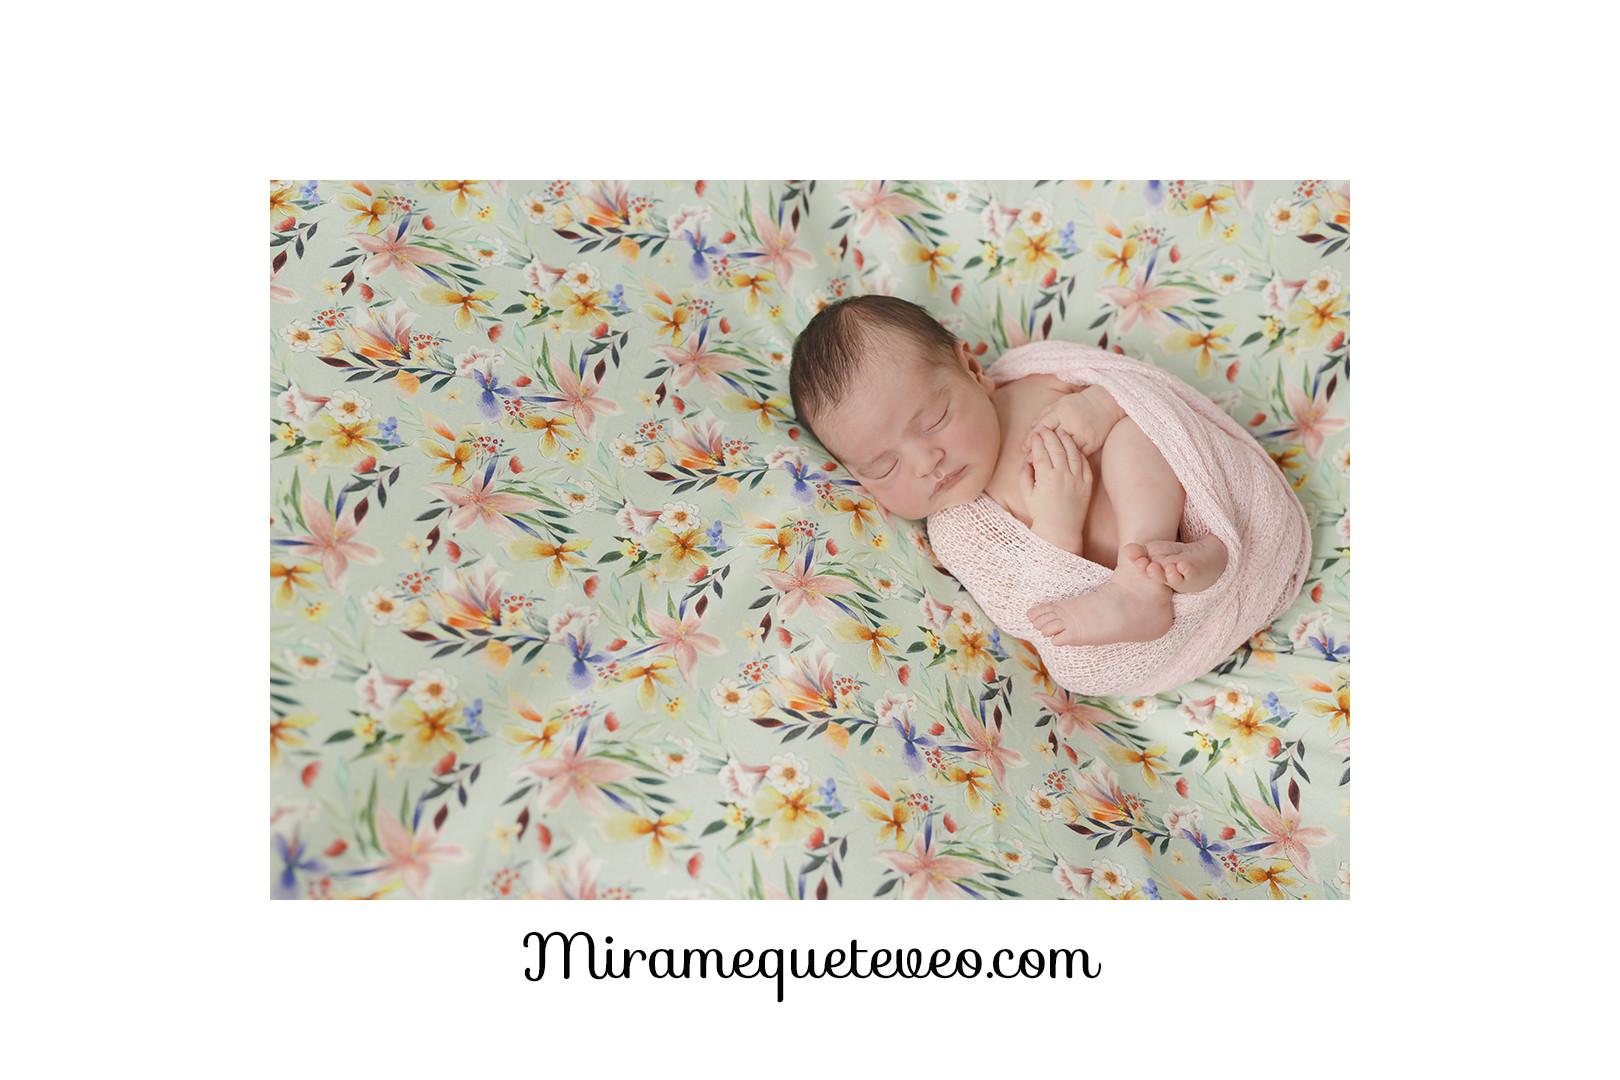 newborn Ariadna MIRAMEQUETEVEO